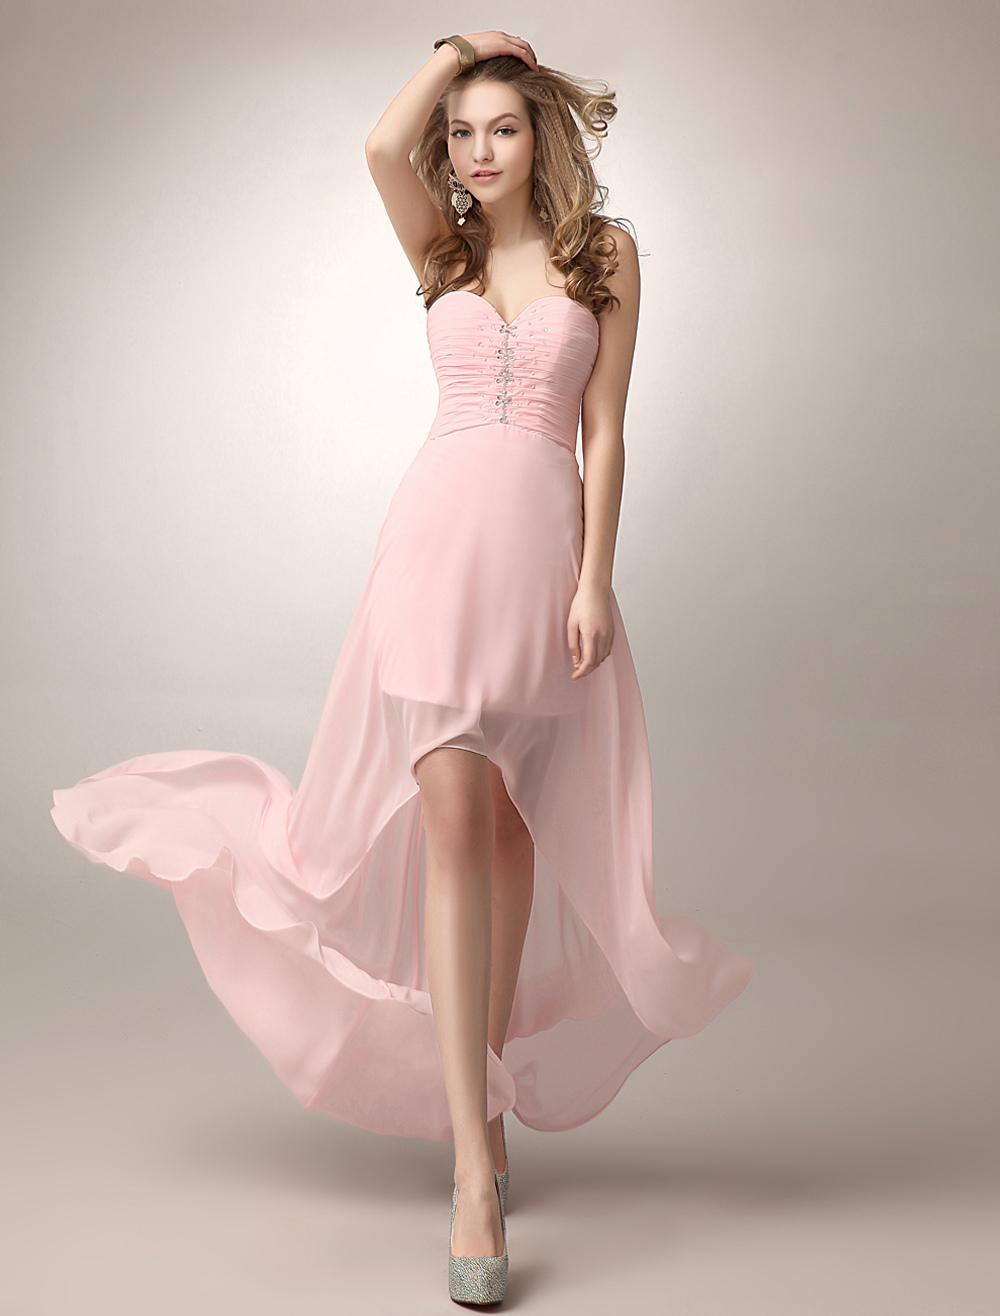 Blush Pink A-line Beading Chiffon Bridesmaid Dress With Sweetheart Neck